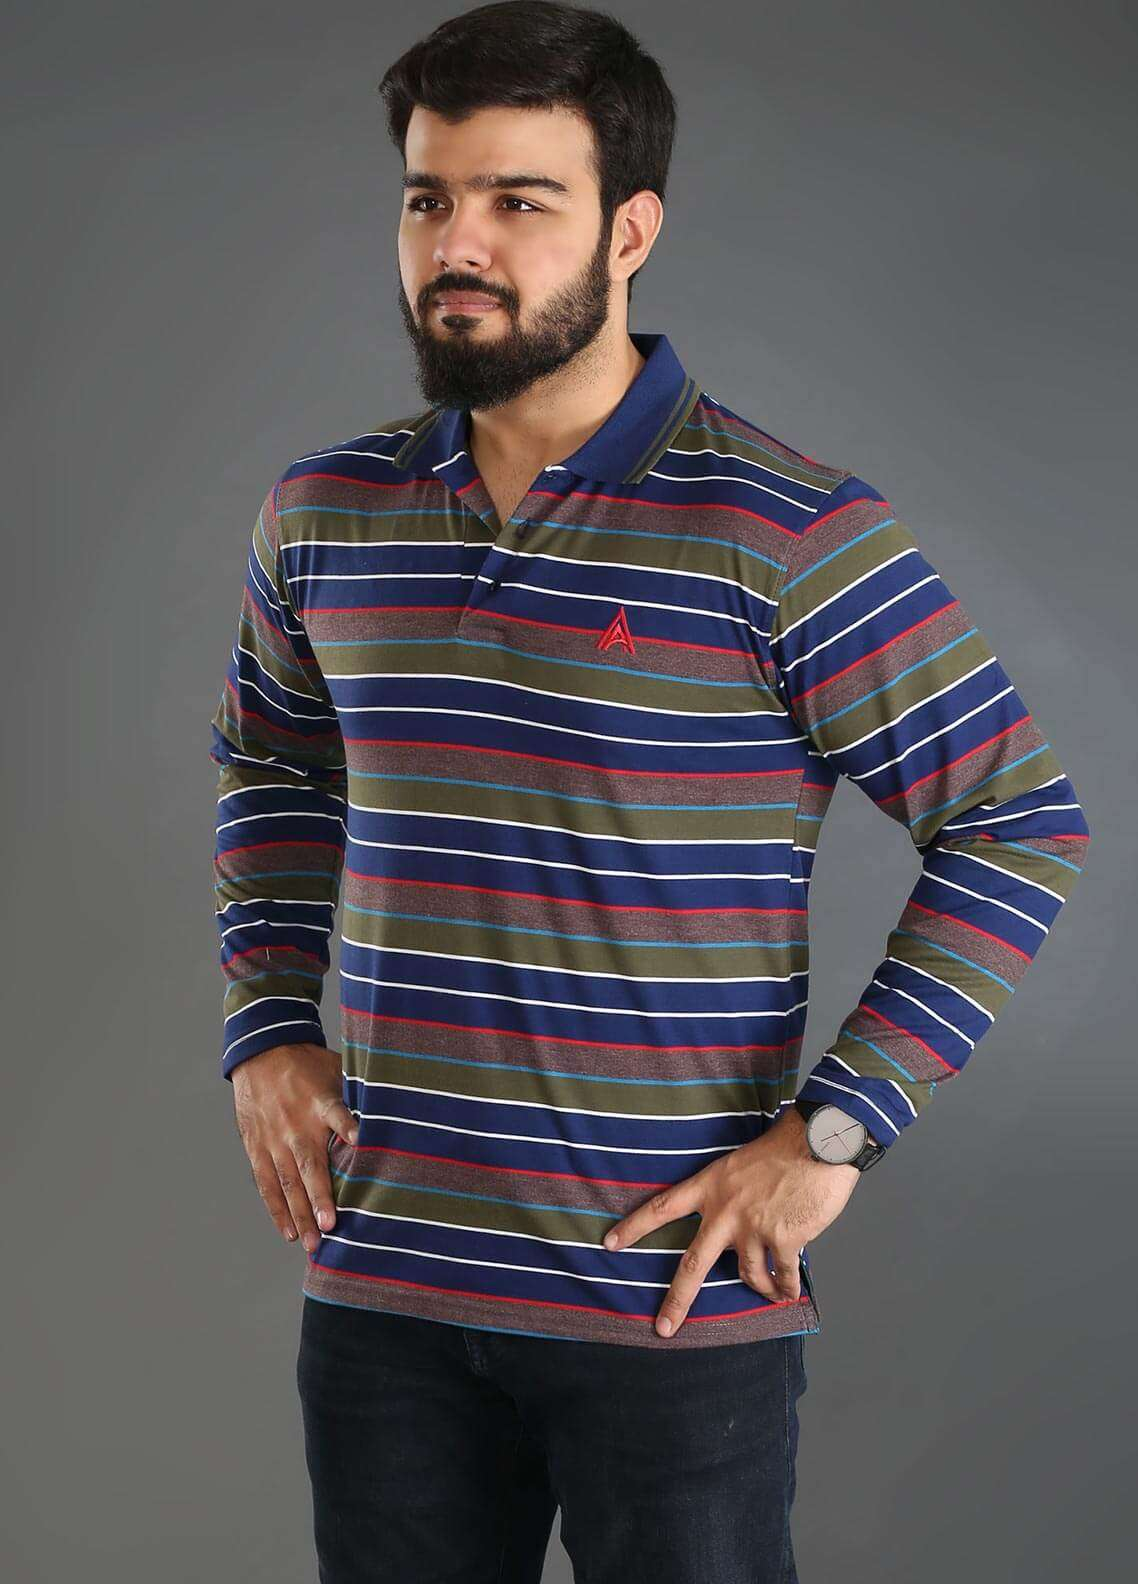 Anchor Jersey Polo Men T-Shirts - Multi A-219